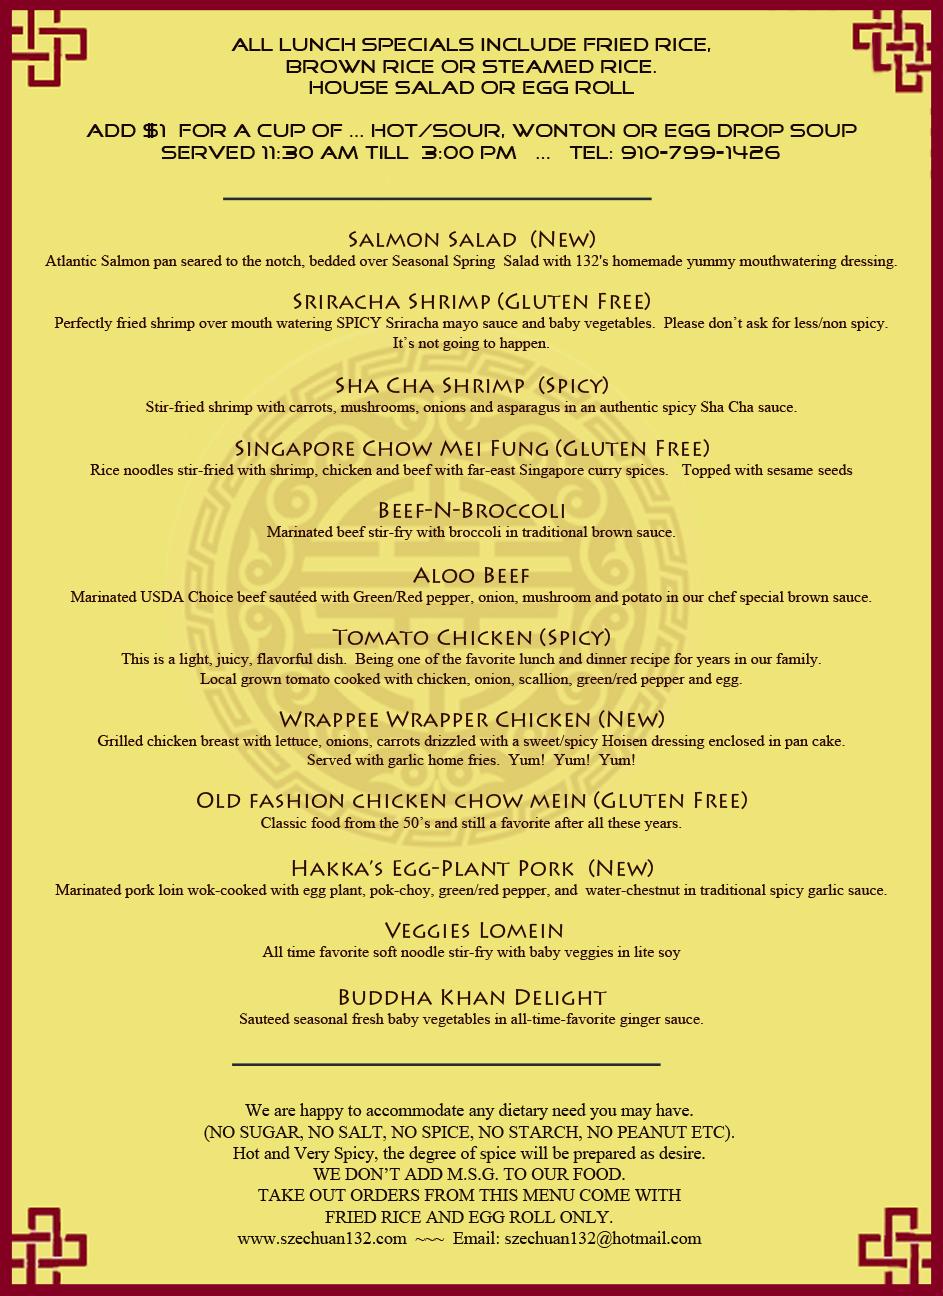 06-12-17 Lunch menu